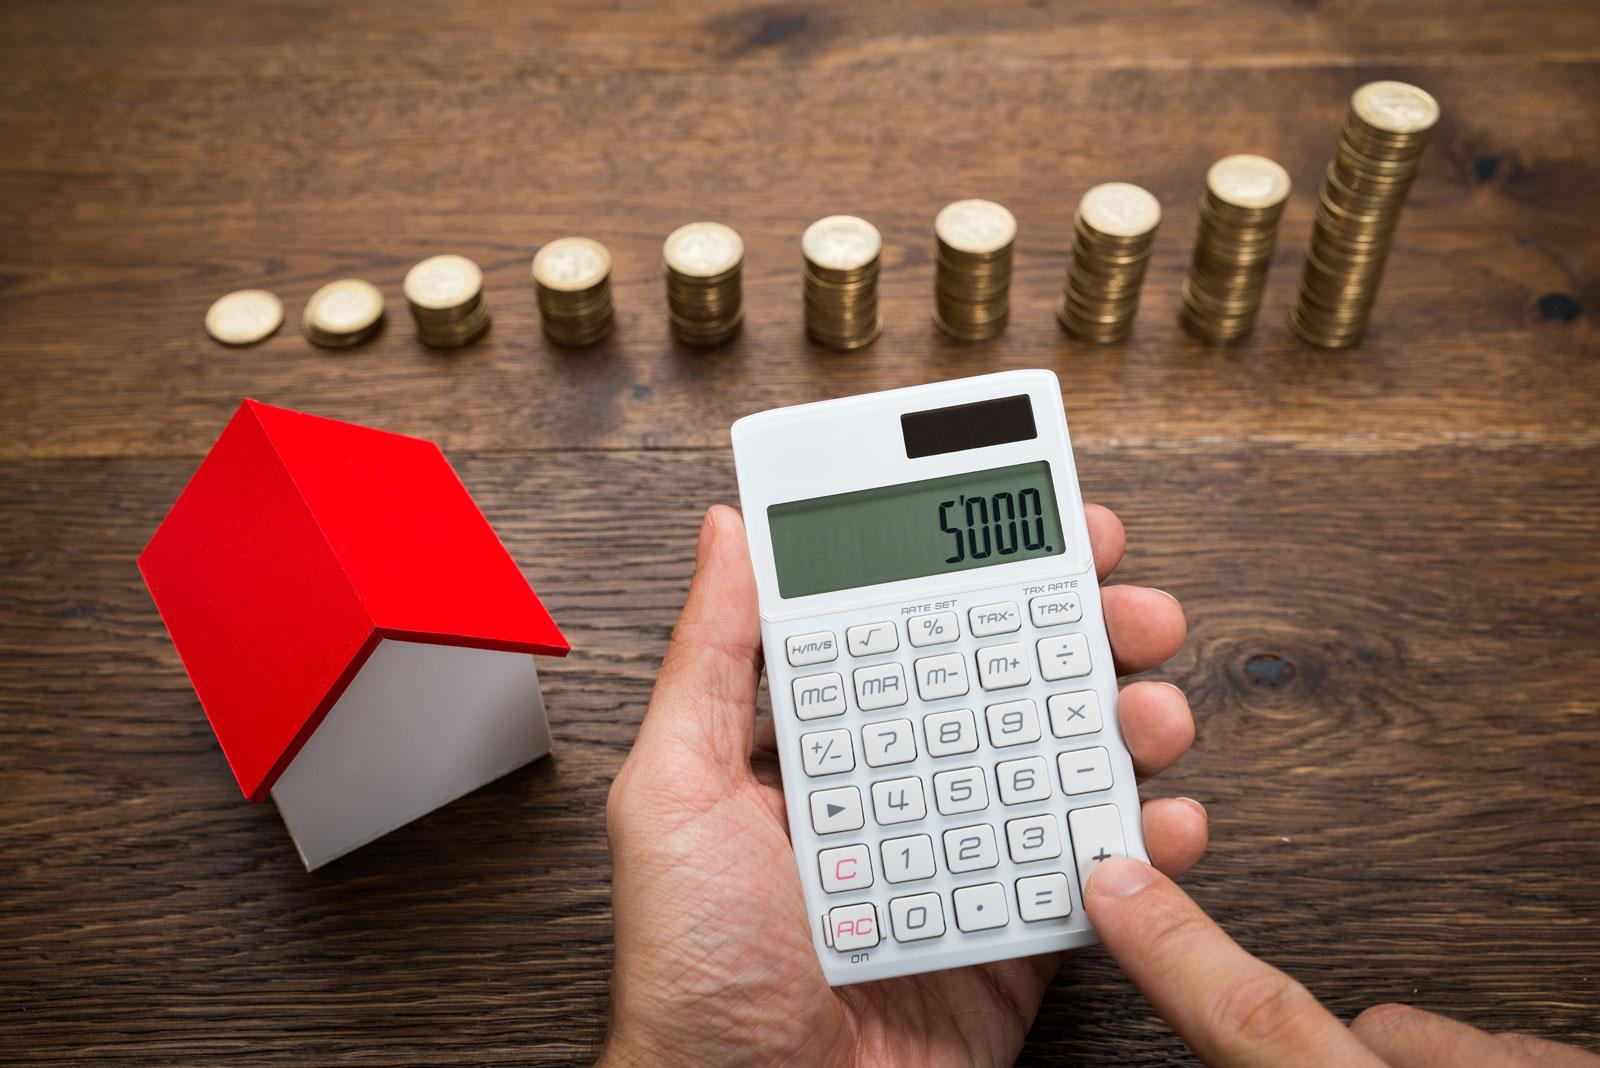 Queensland Rent Reforms May Cost Tenants $5,000 Per Year